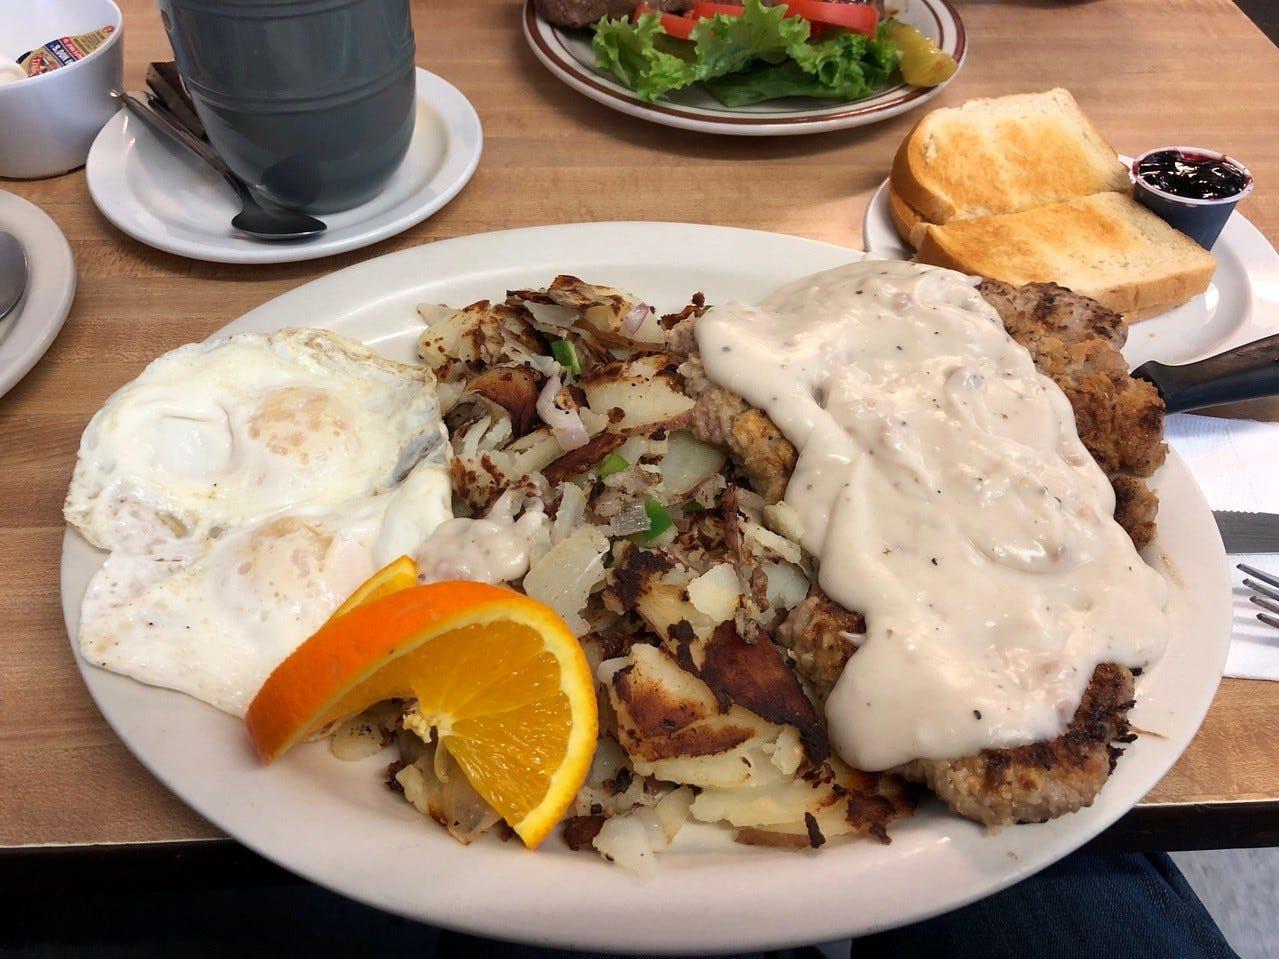 The popular chicken fried steak and eggs at Rita's Kitchen.